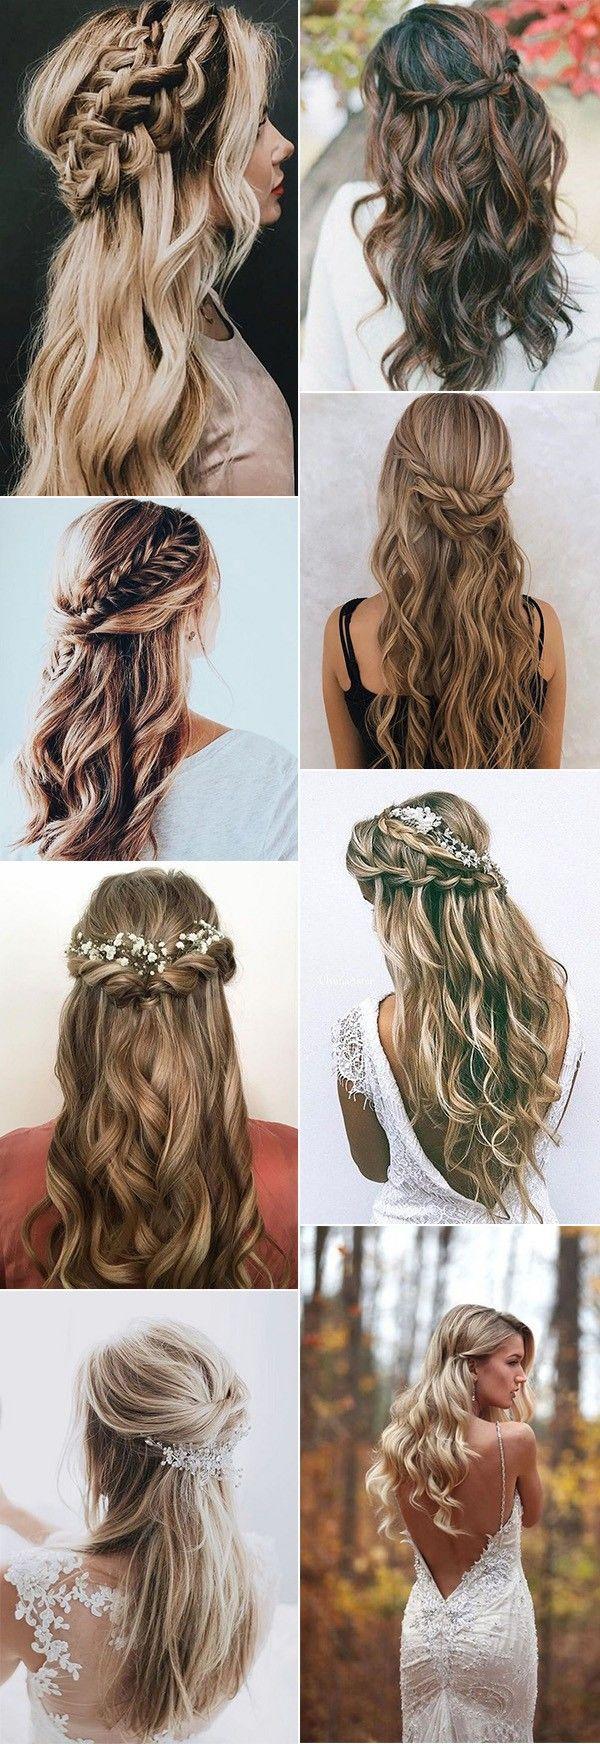 Top 20 Half Up Half Down Wedding Hairstyles for 2018/2019 – Arlene